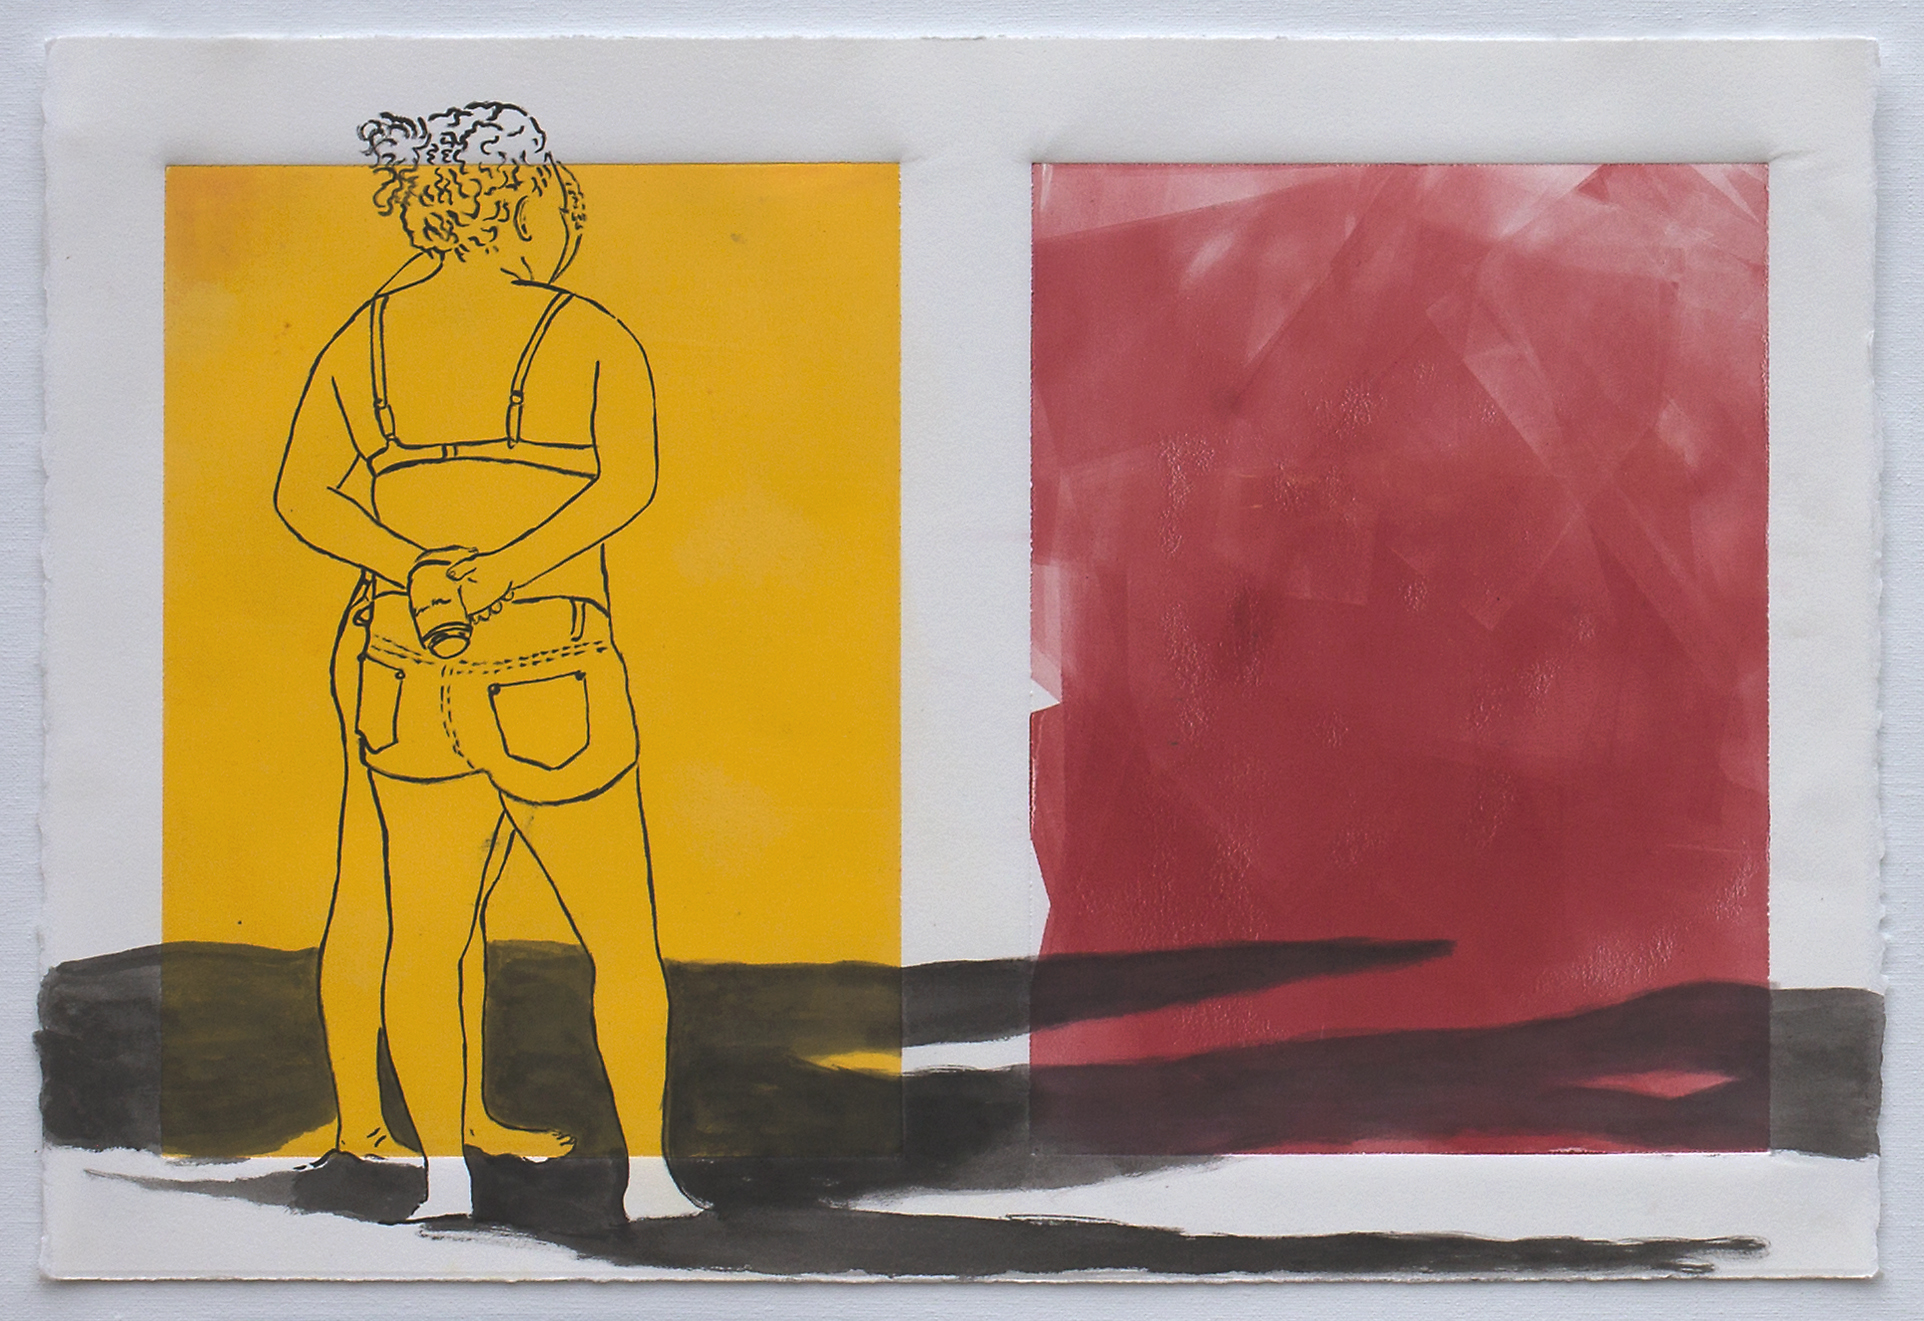 "@2016, Malayka Gormally,  Shadows . India ink over monotype print, 15"" x 22""."